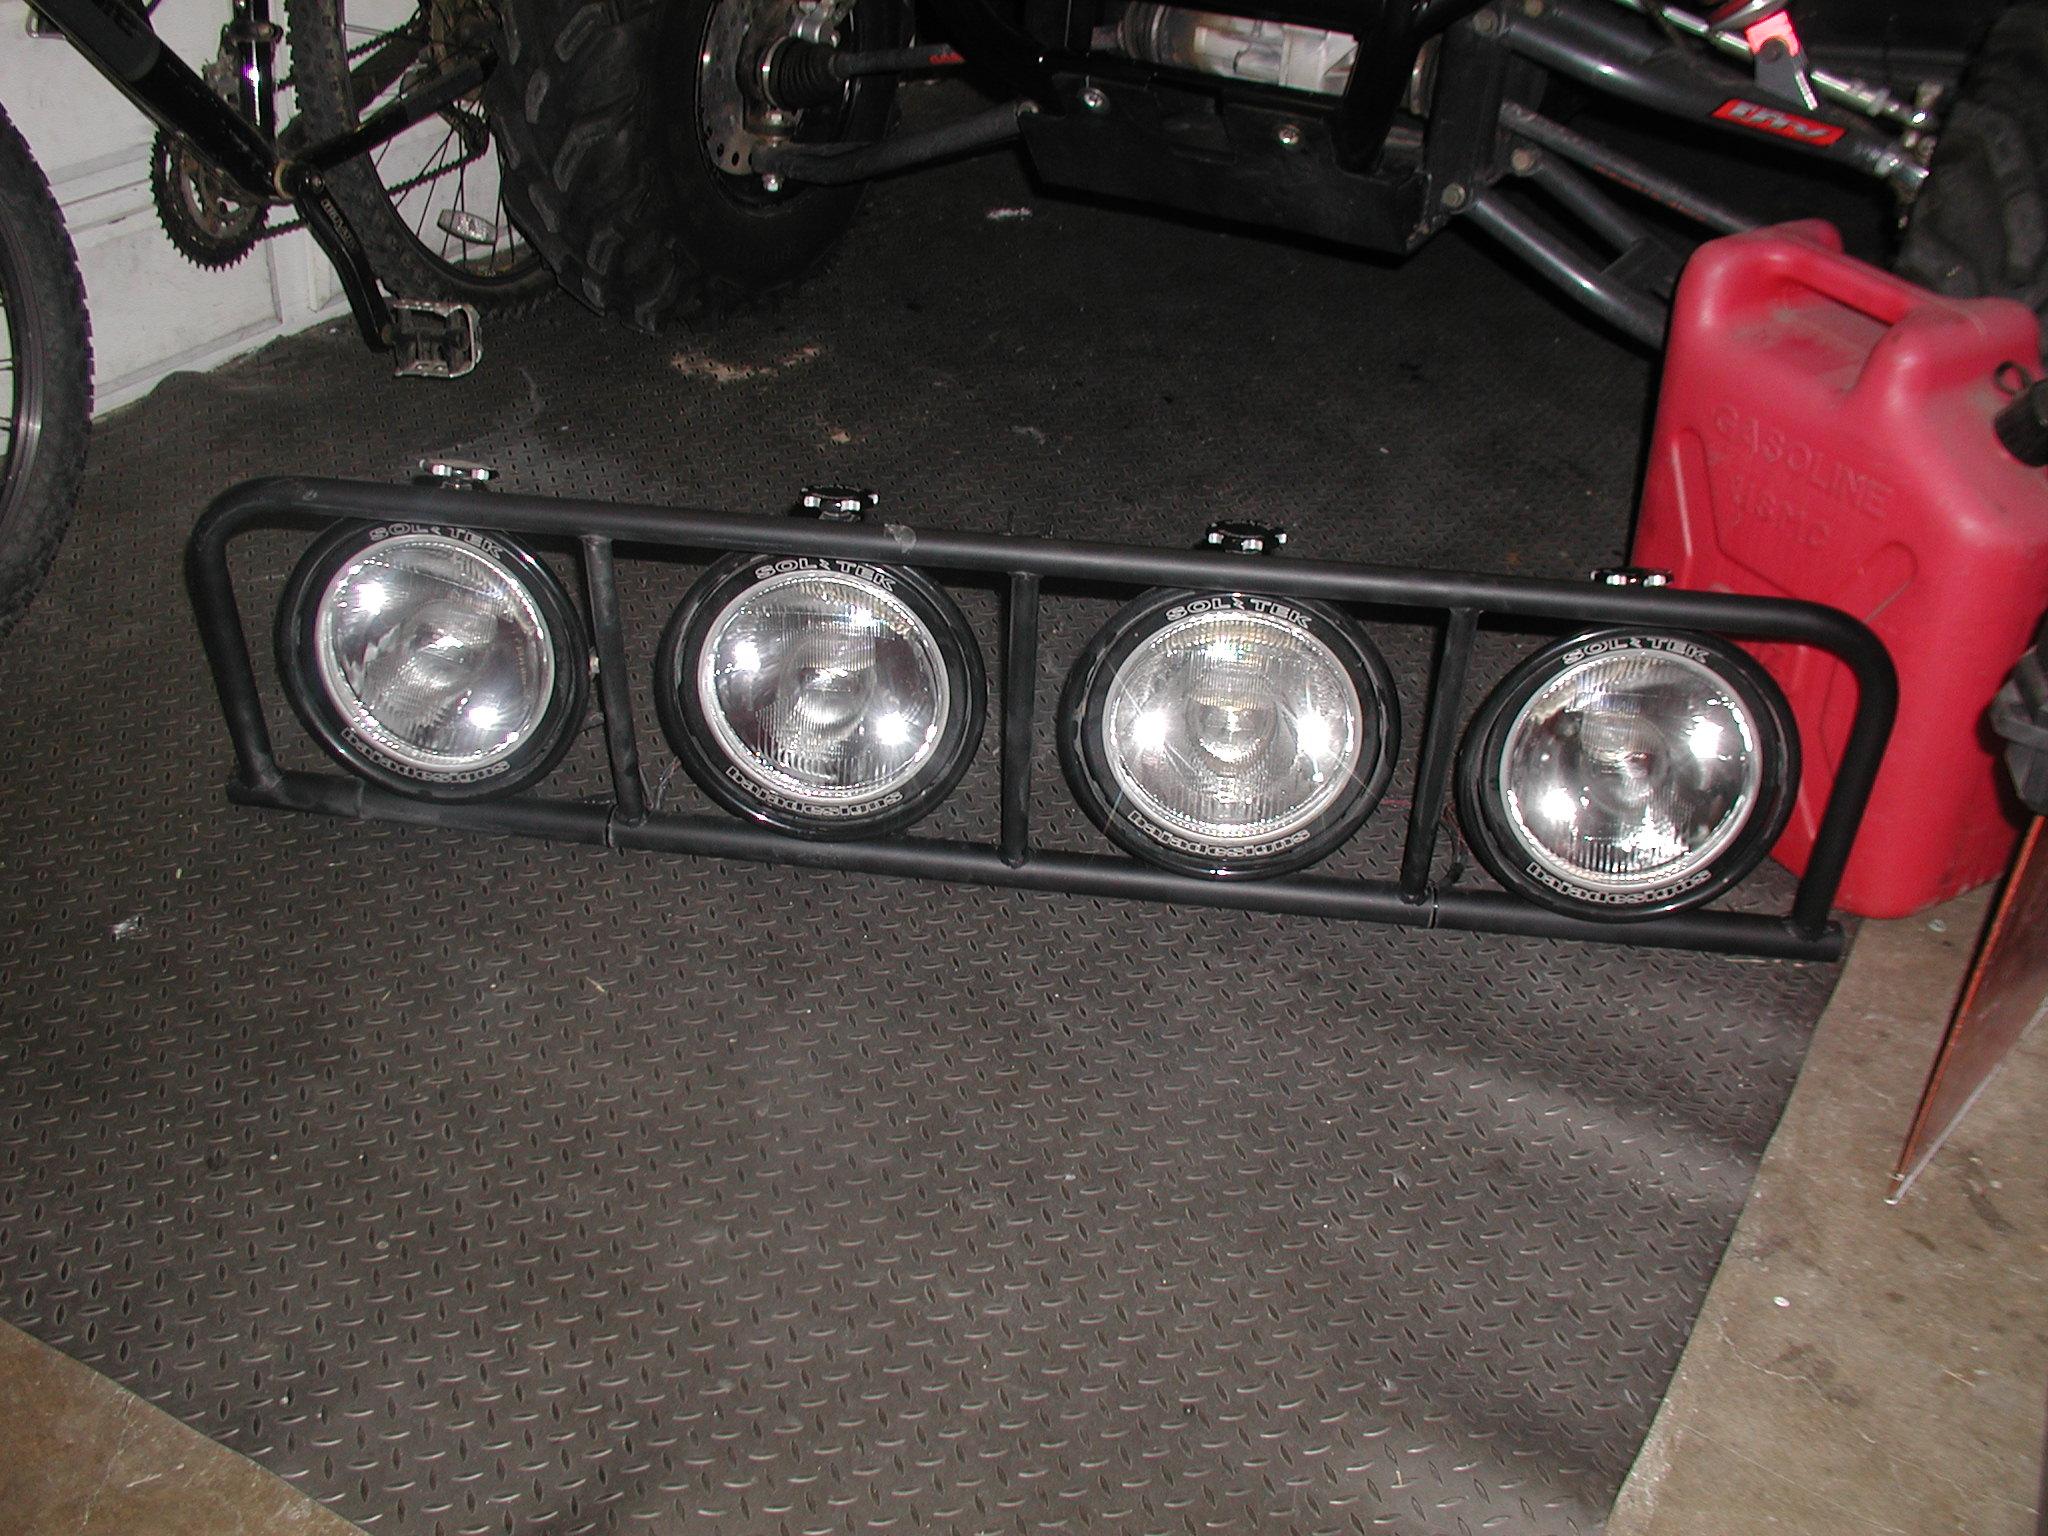 Baja design light bar light gallery light ideas baja design light bar light database light ideas 8 baja design hid lights with light bar aloadofball Image collections